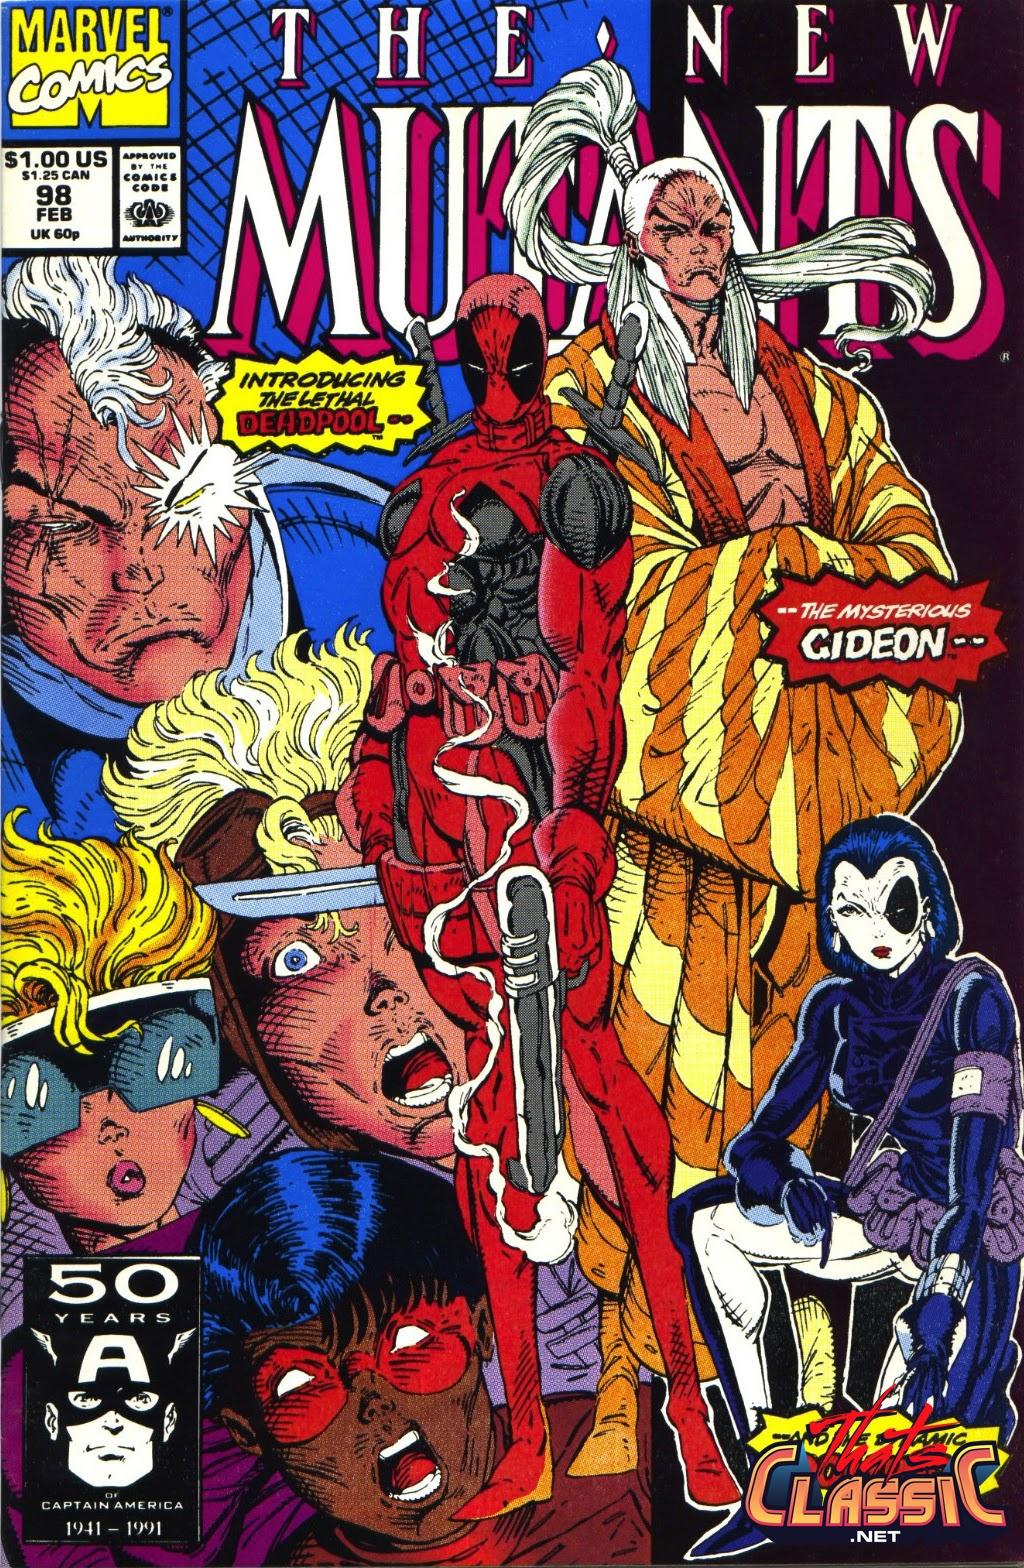 Deadpool-origins-New-Mutants-98